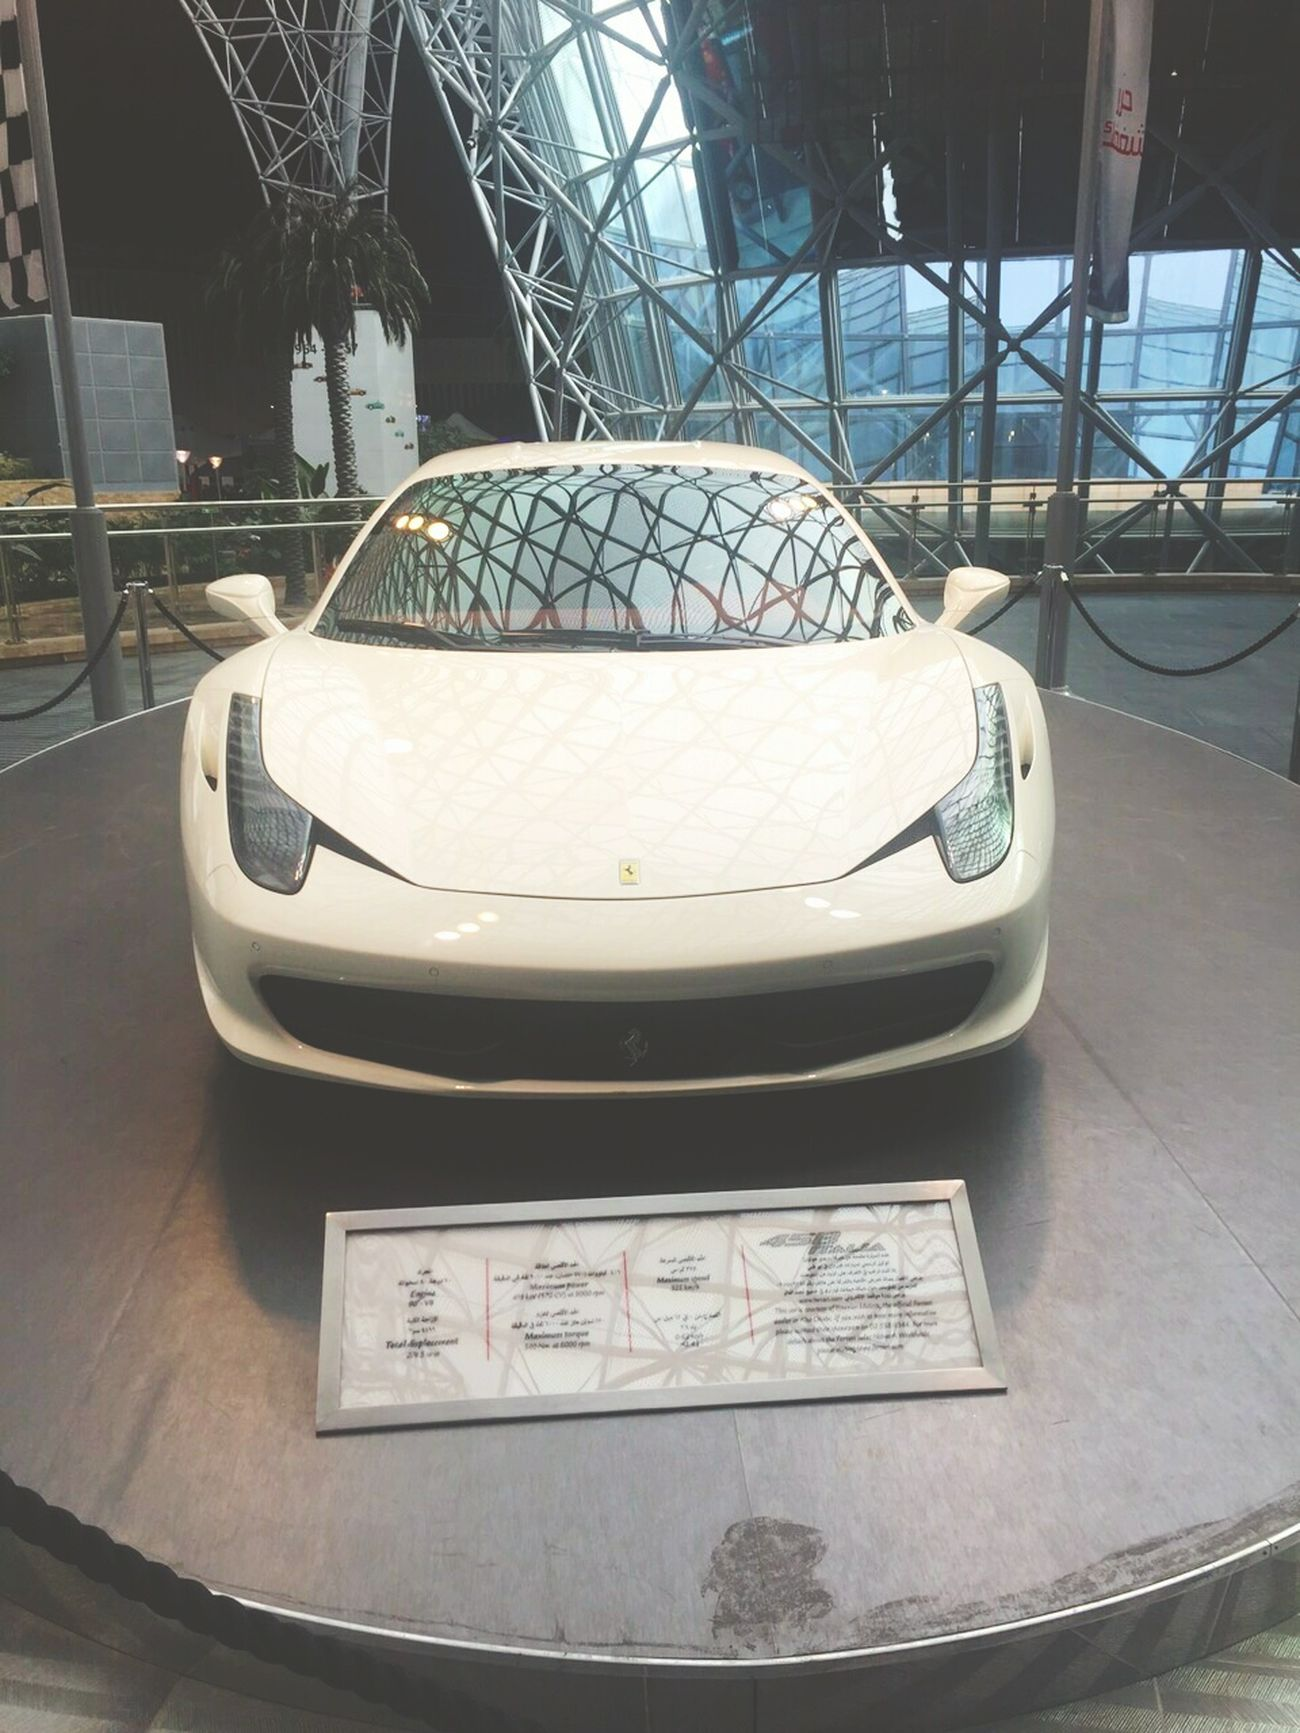 Ferrari World Abudhabi Unitedarabemirates Abudhabi Lifeinuae Ferrariworld Ferrari 🚘🚘🚘👌👌🌐